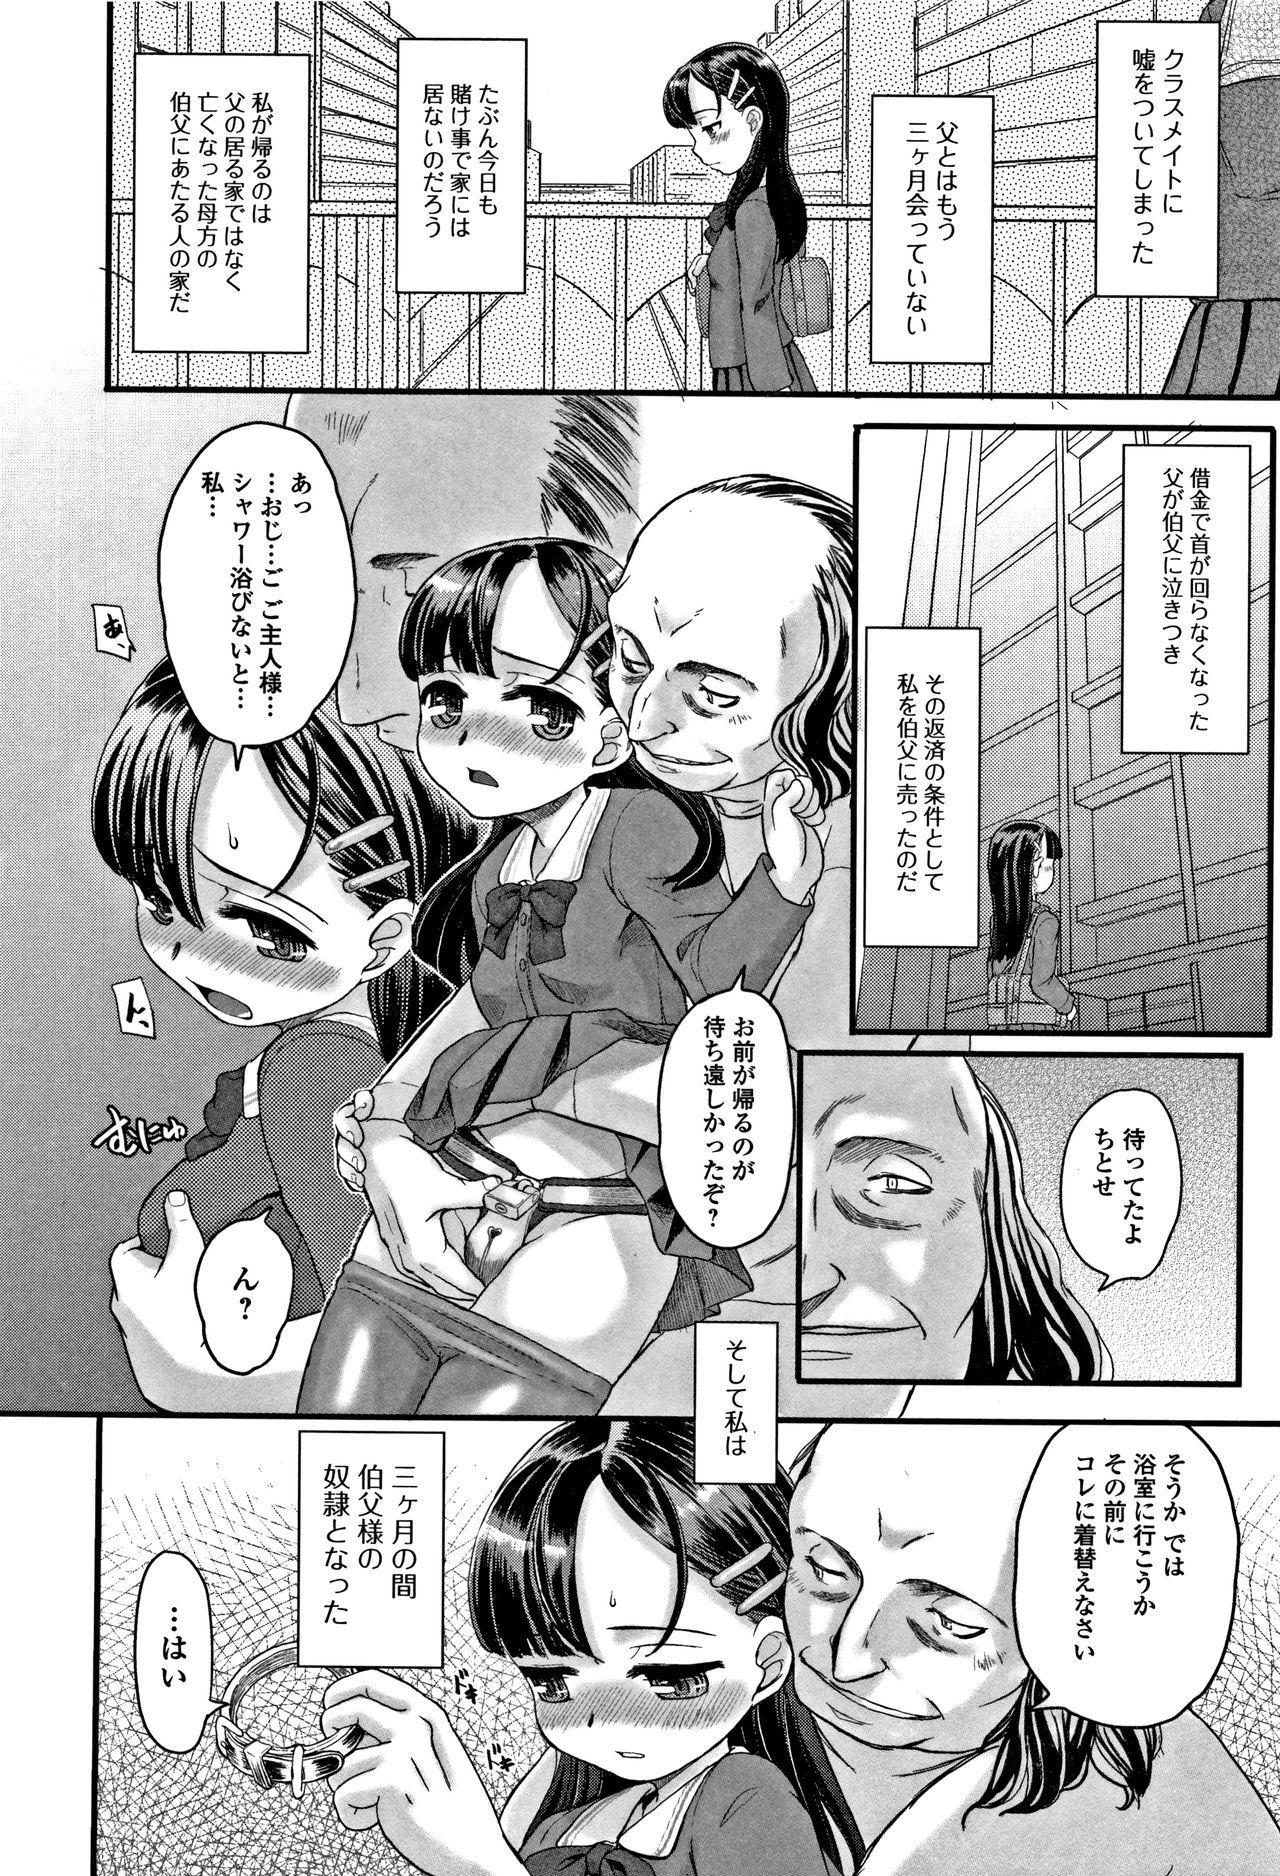 Himitsu Teardrops 178